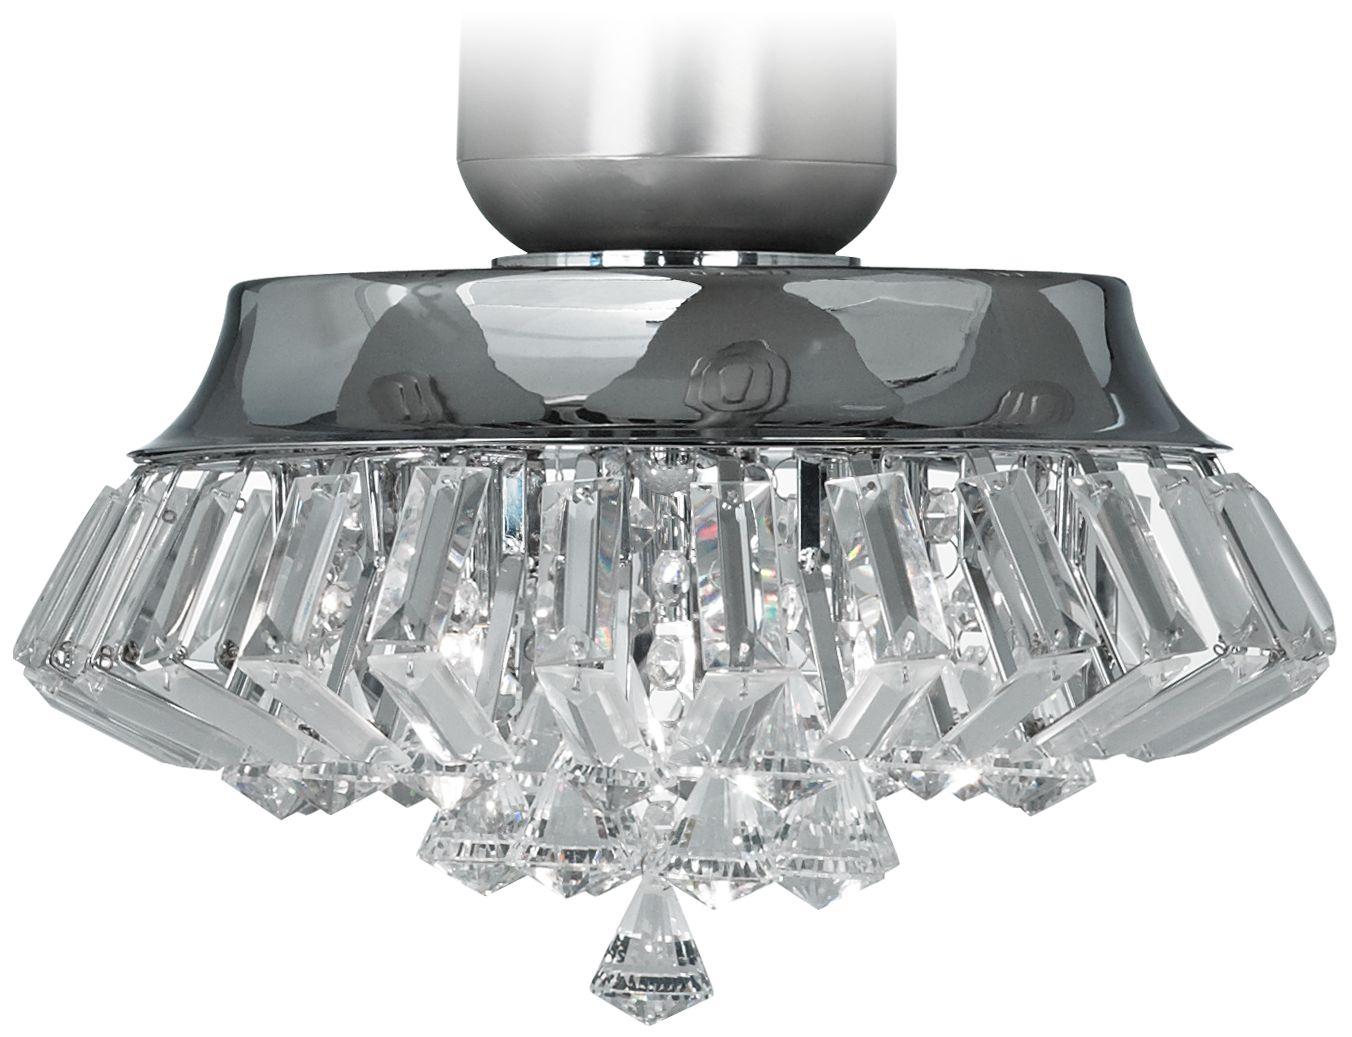 Captivating Deco Crystal Chrome Universal Ceiling Fan Light Kit